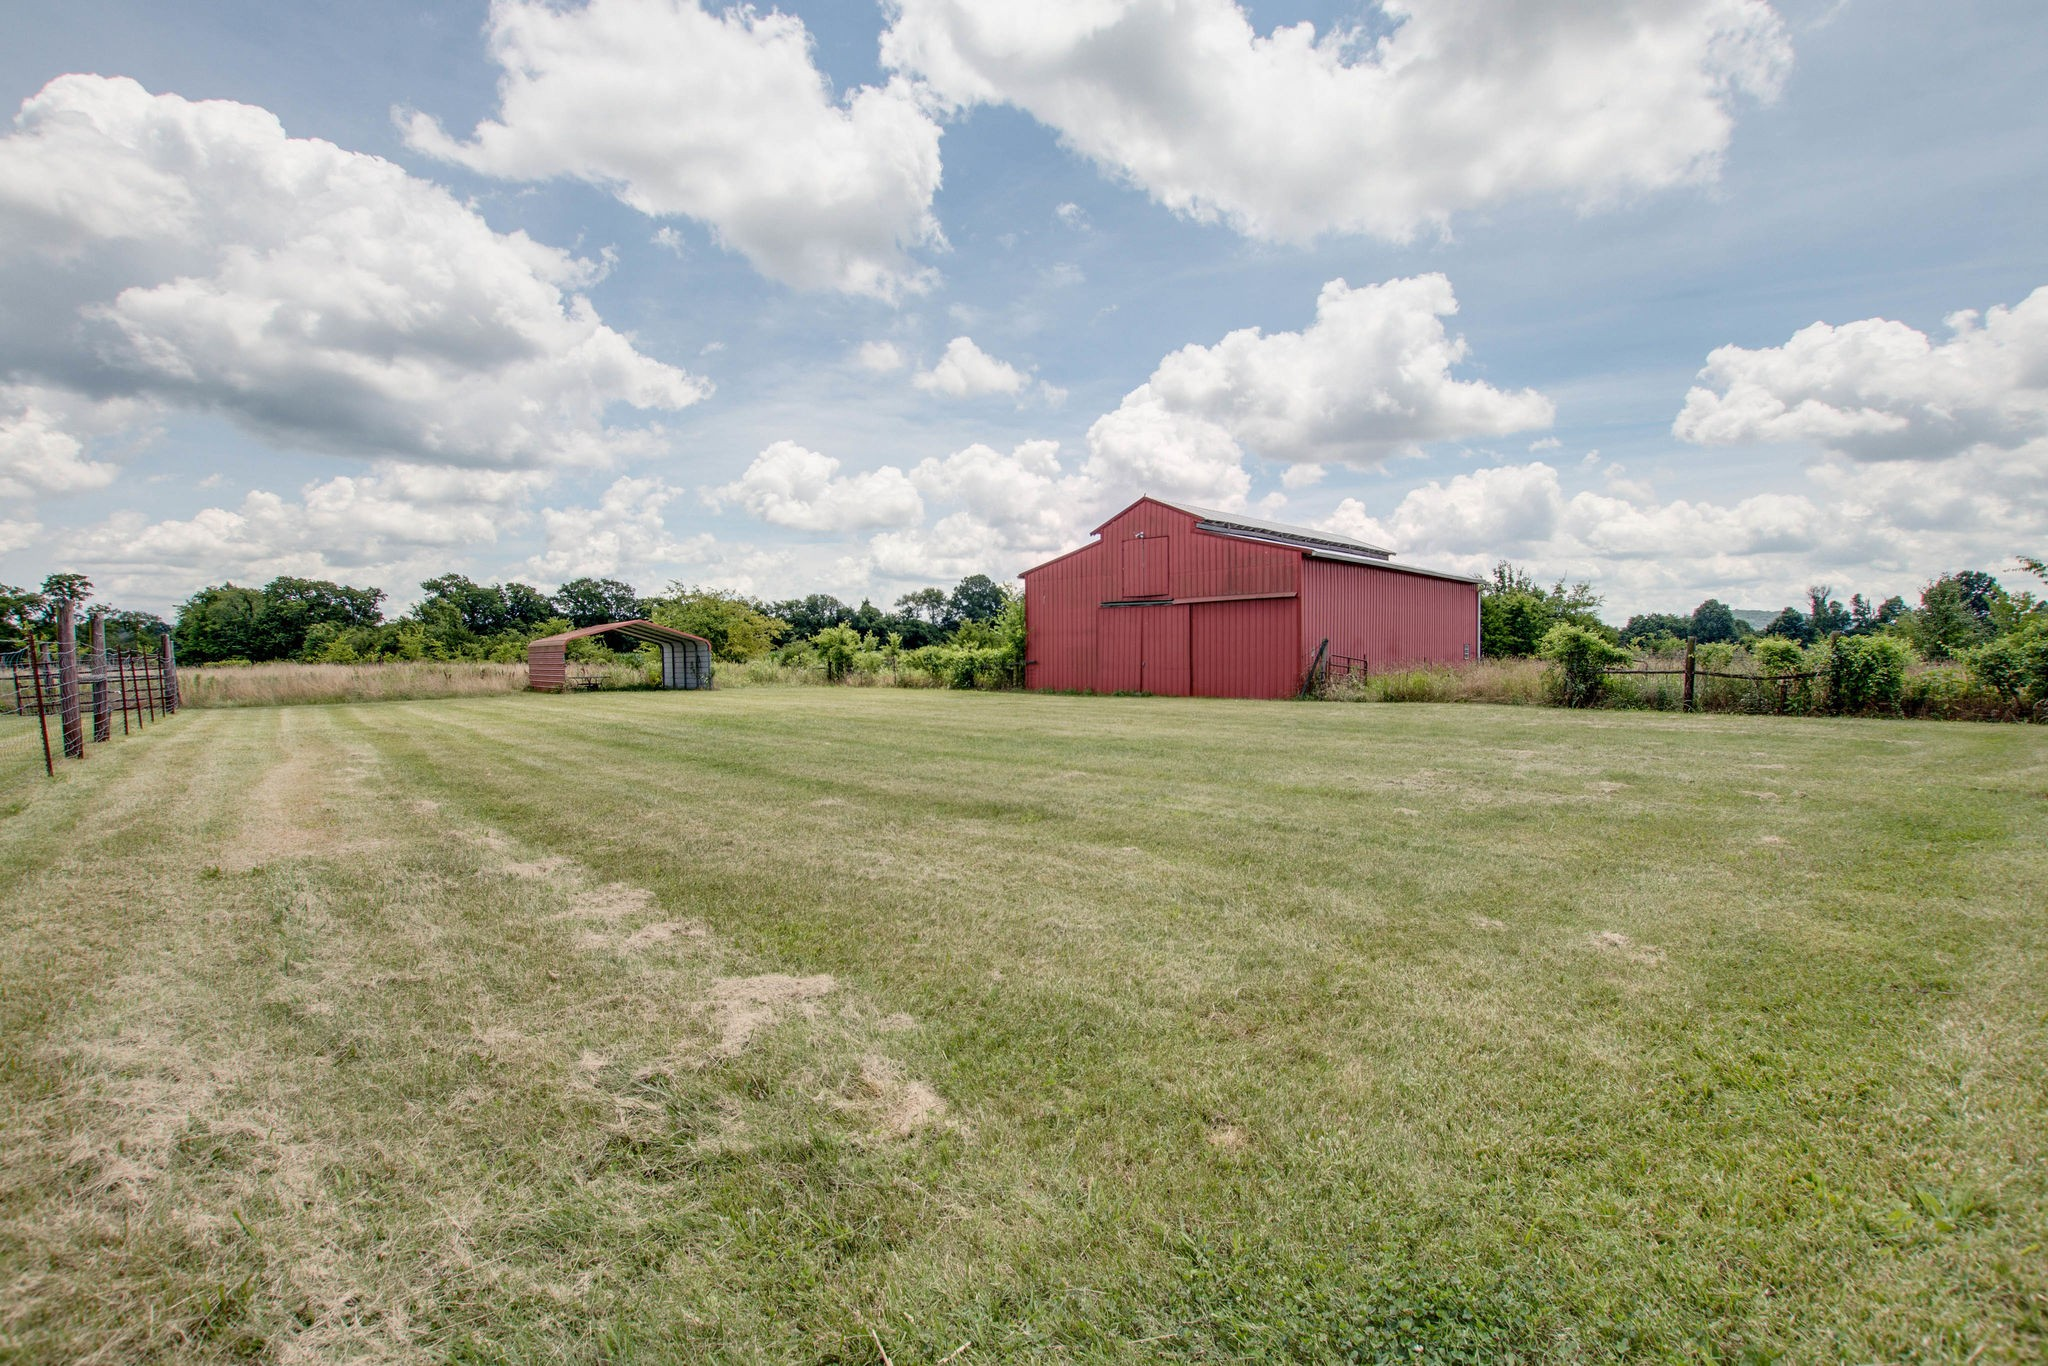 12321 Highway 99, Rockvale, TN 37153 - Rockvale, TN real estate listing